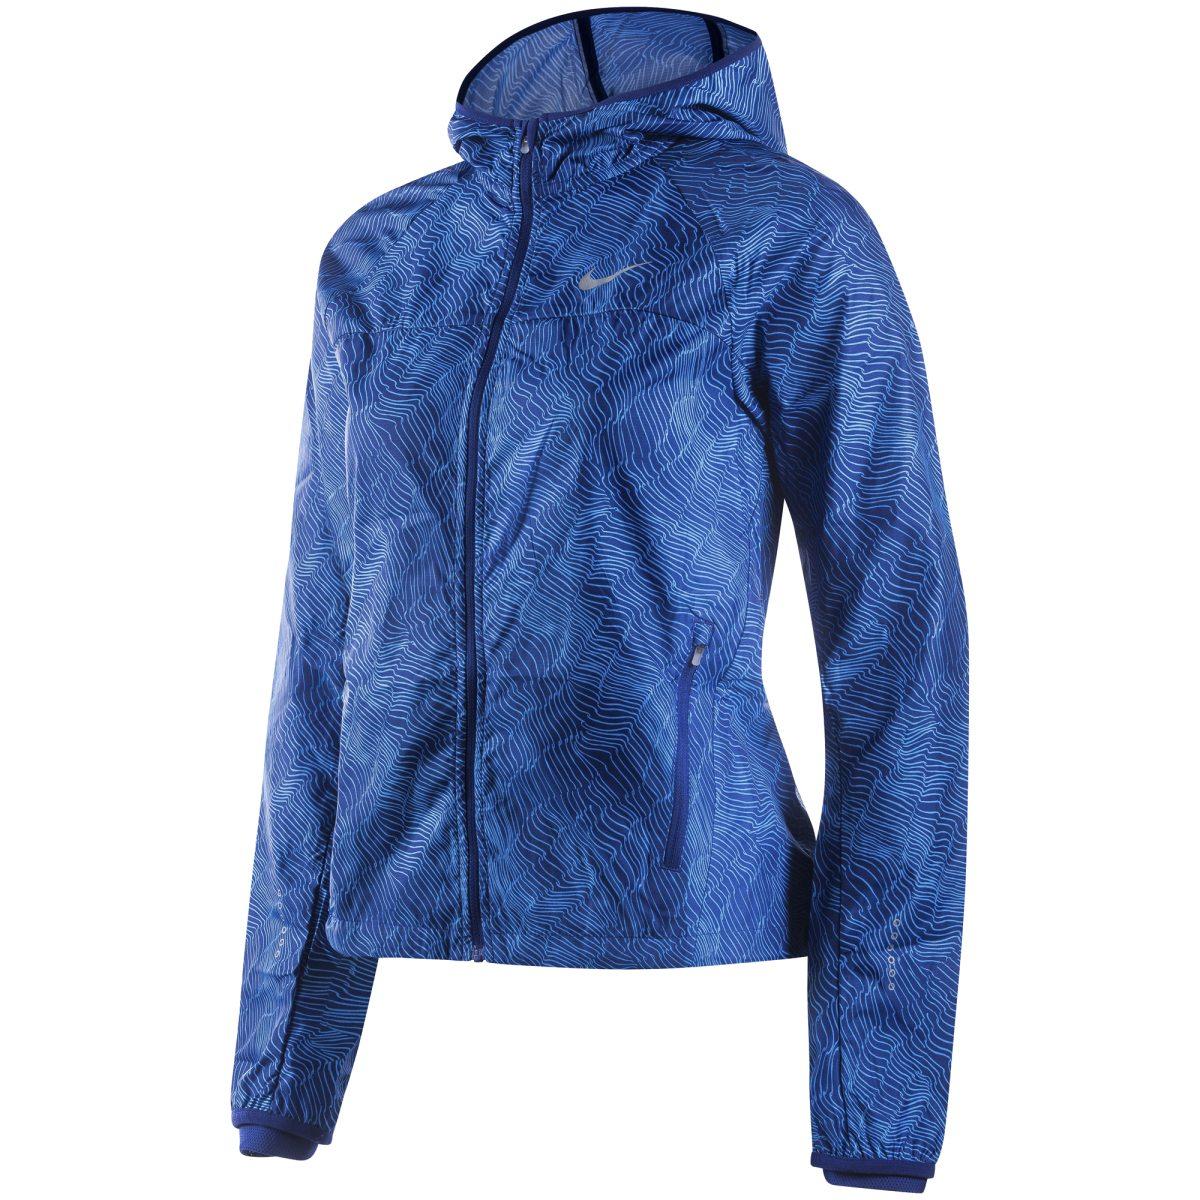 bf07870b Find treningsjakke dame treningsjakker. Shop every store on the ...